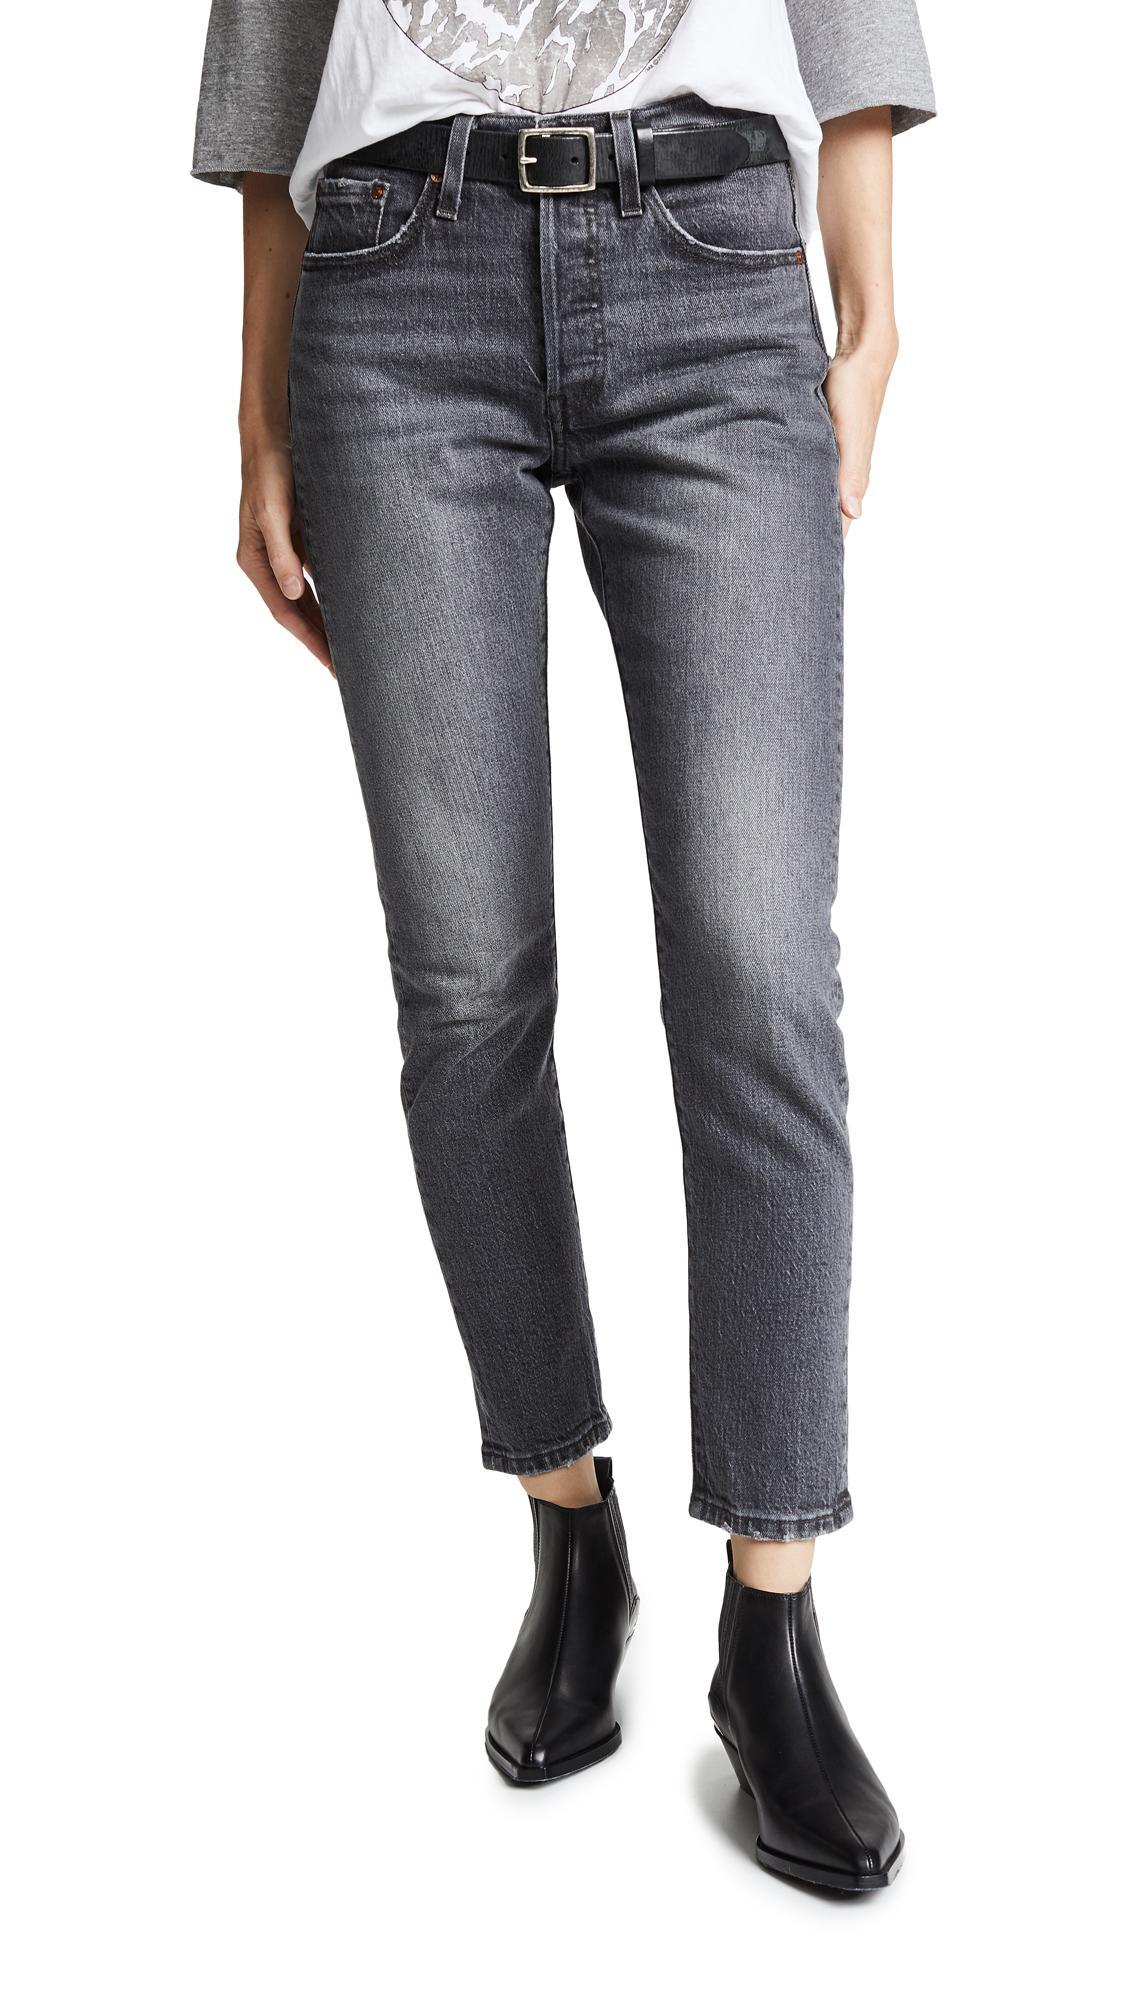 17be75d4 Levi's 501 Stretch Skinny Jeans In Coal Black | ModeSens